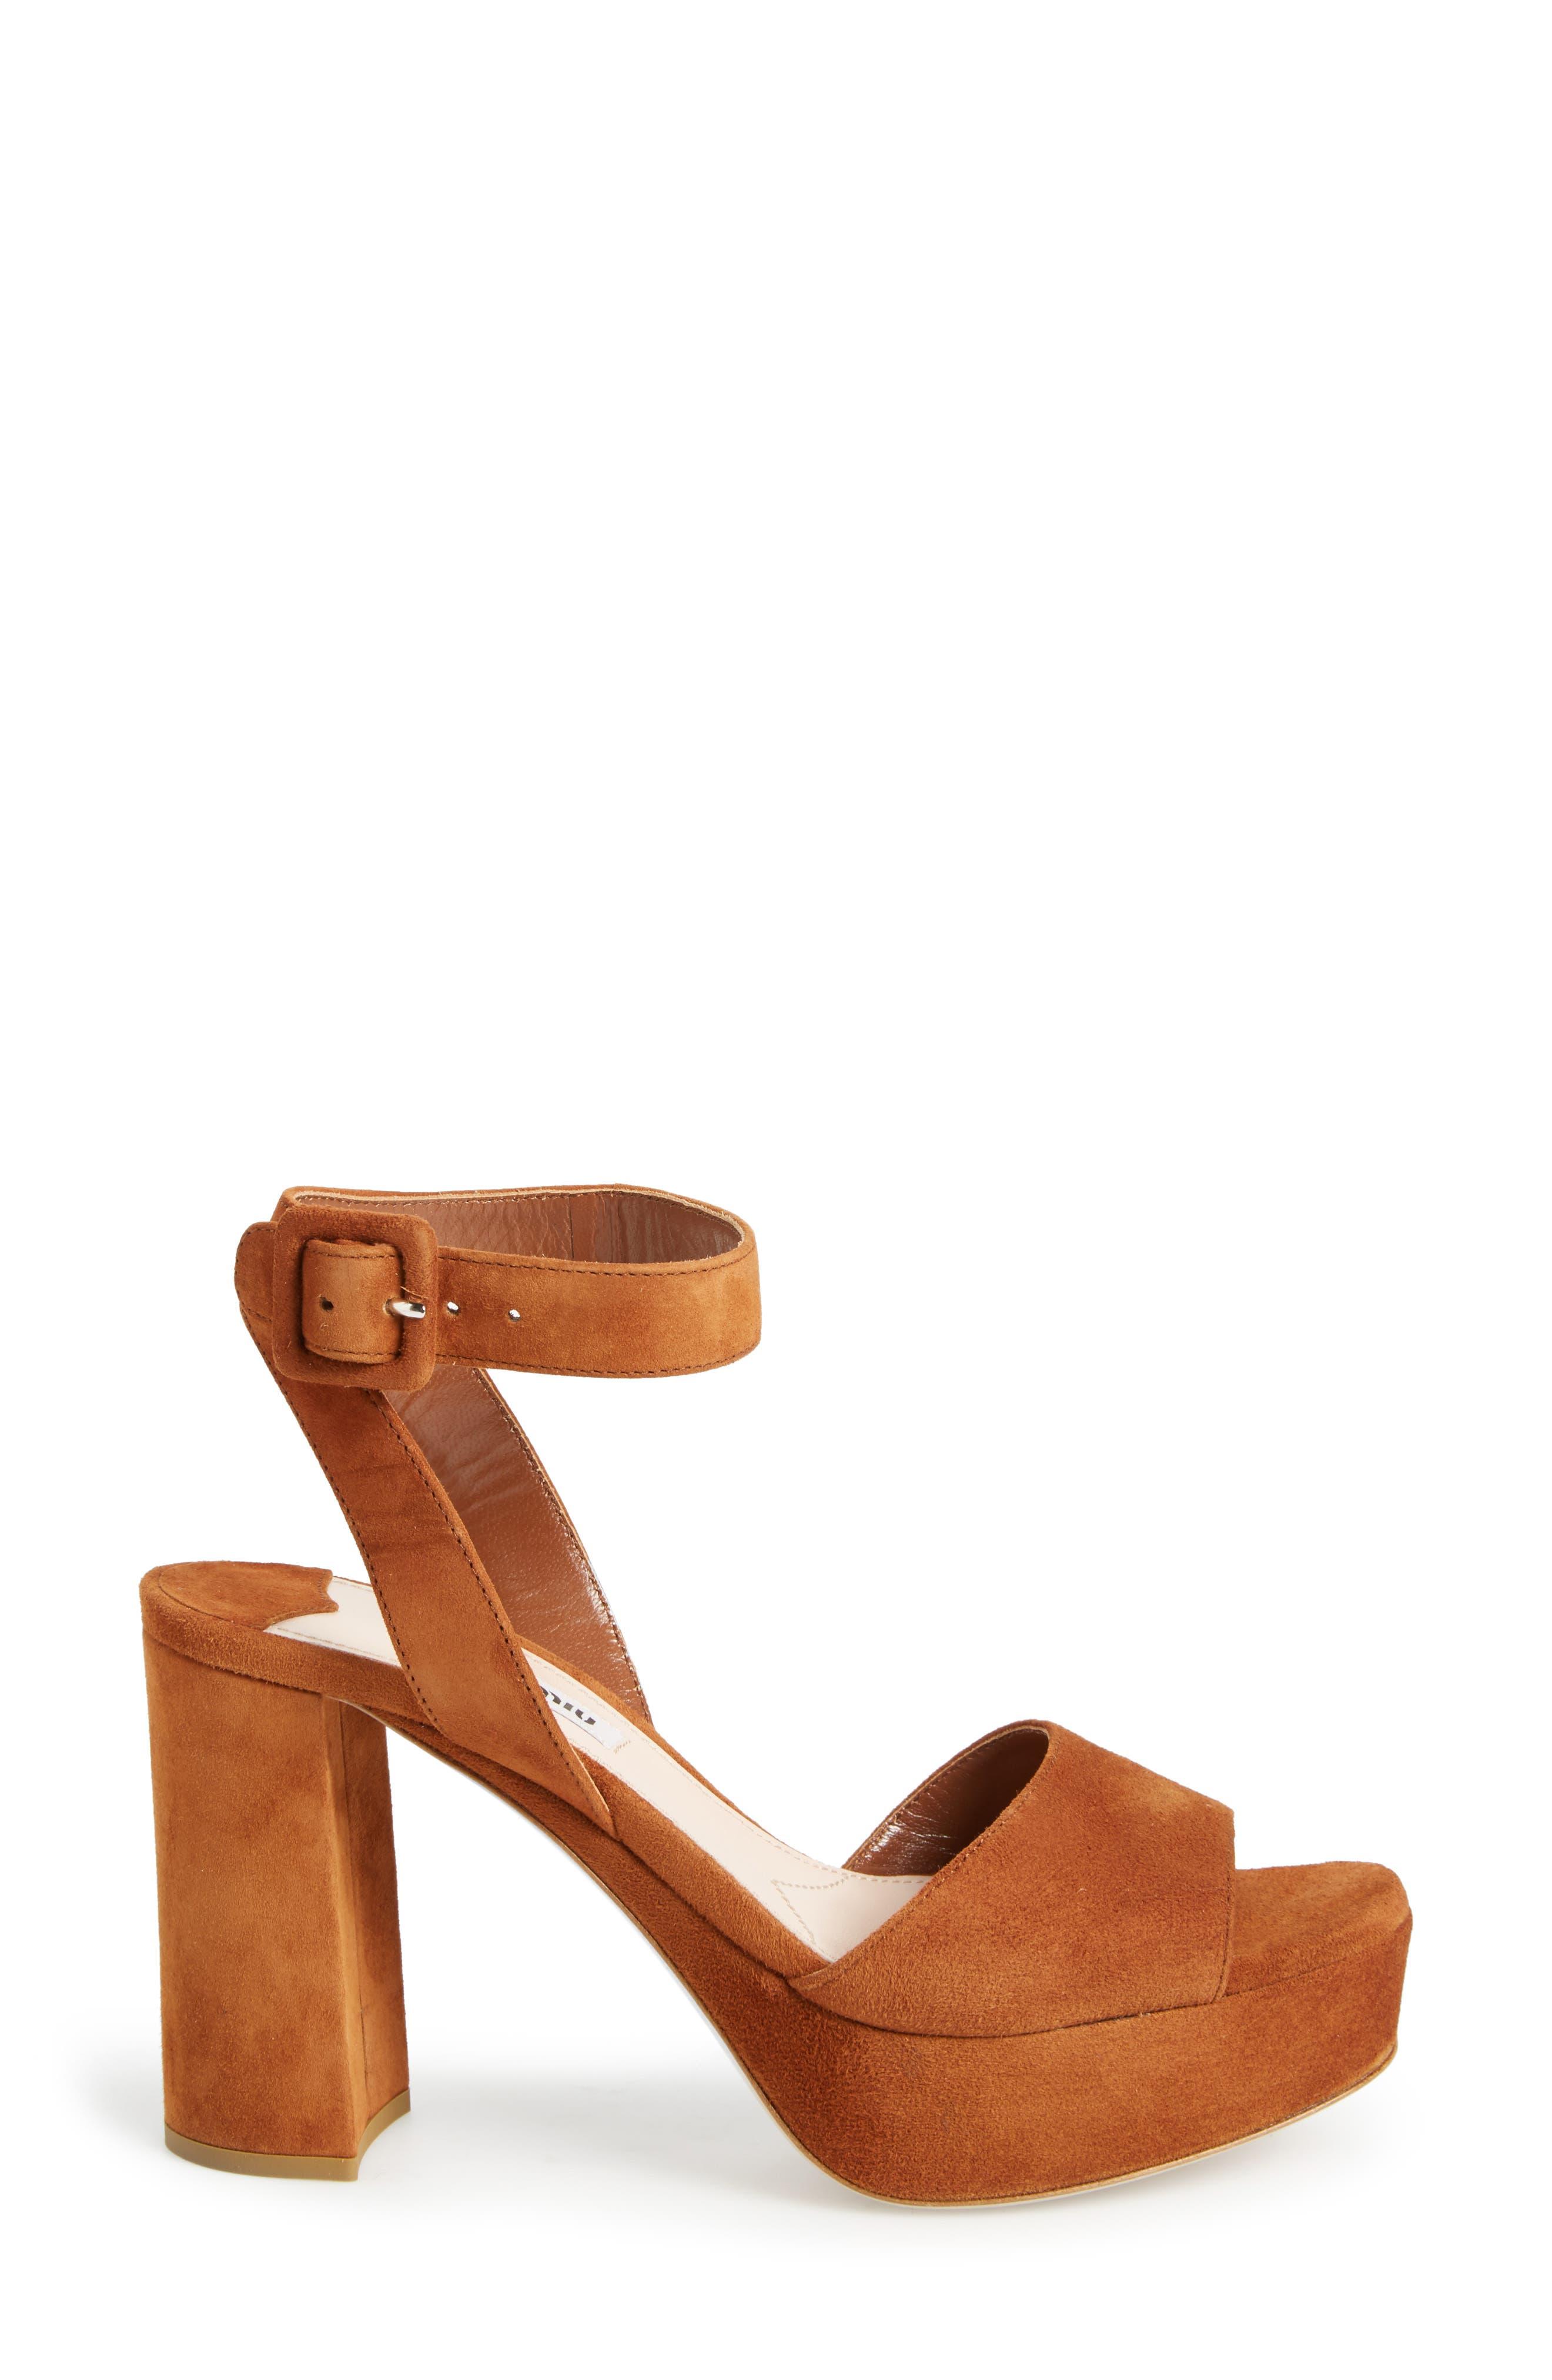 MIU MIU, 'Sandali' Ankle Strap Sandal, Alternate thumbnail 6, color, 200